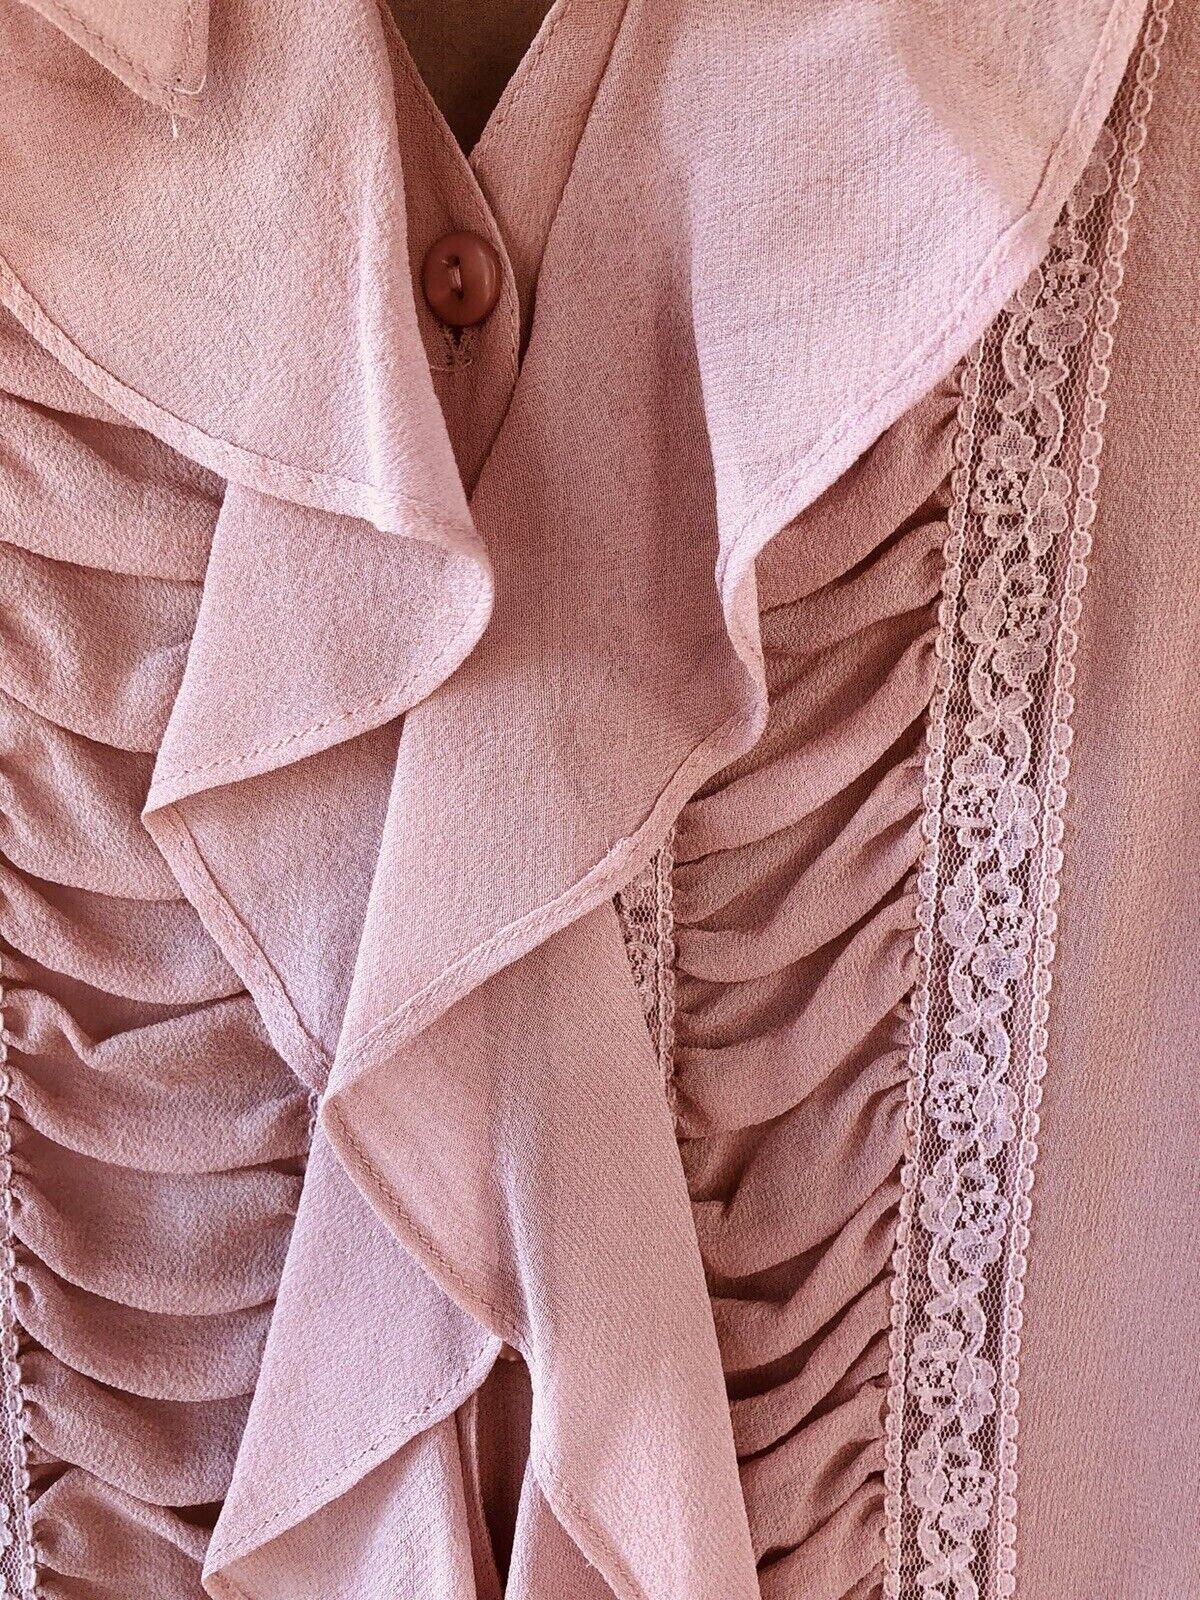 Vintage Stunning Jones Wear Silk Sheer Dusty Lila… - image 4